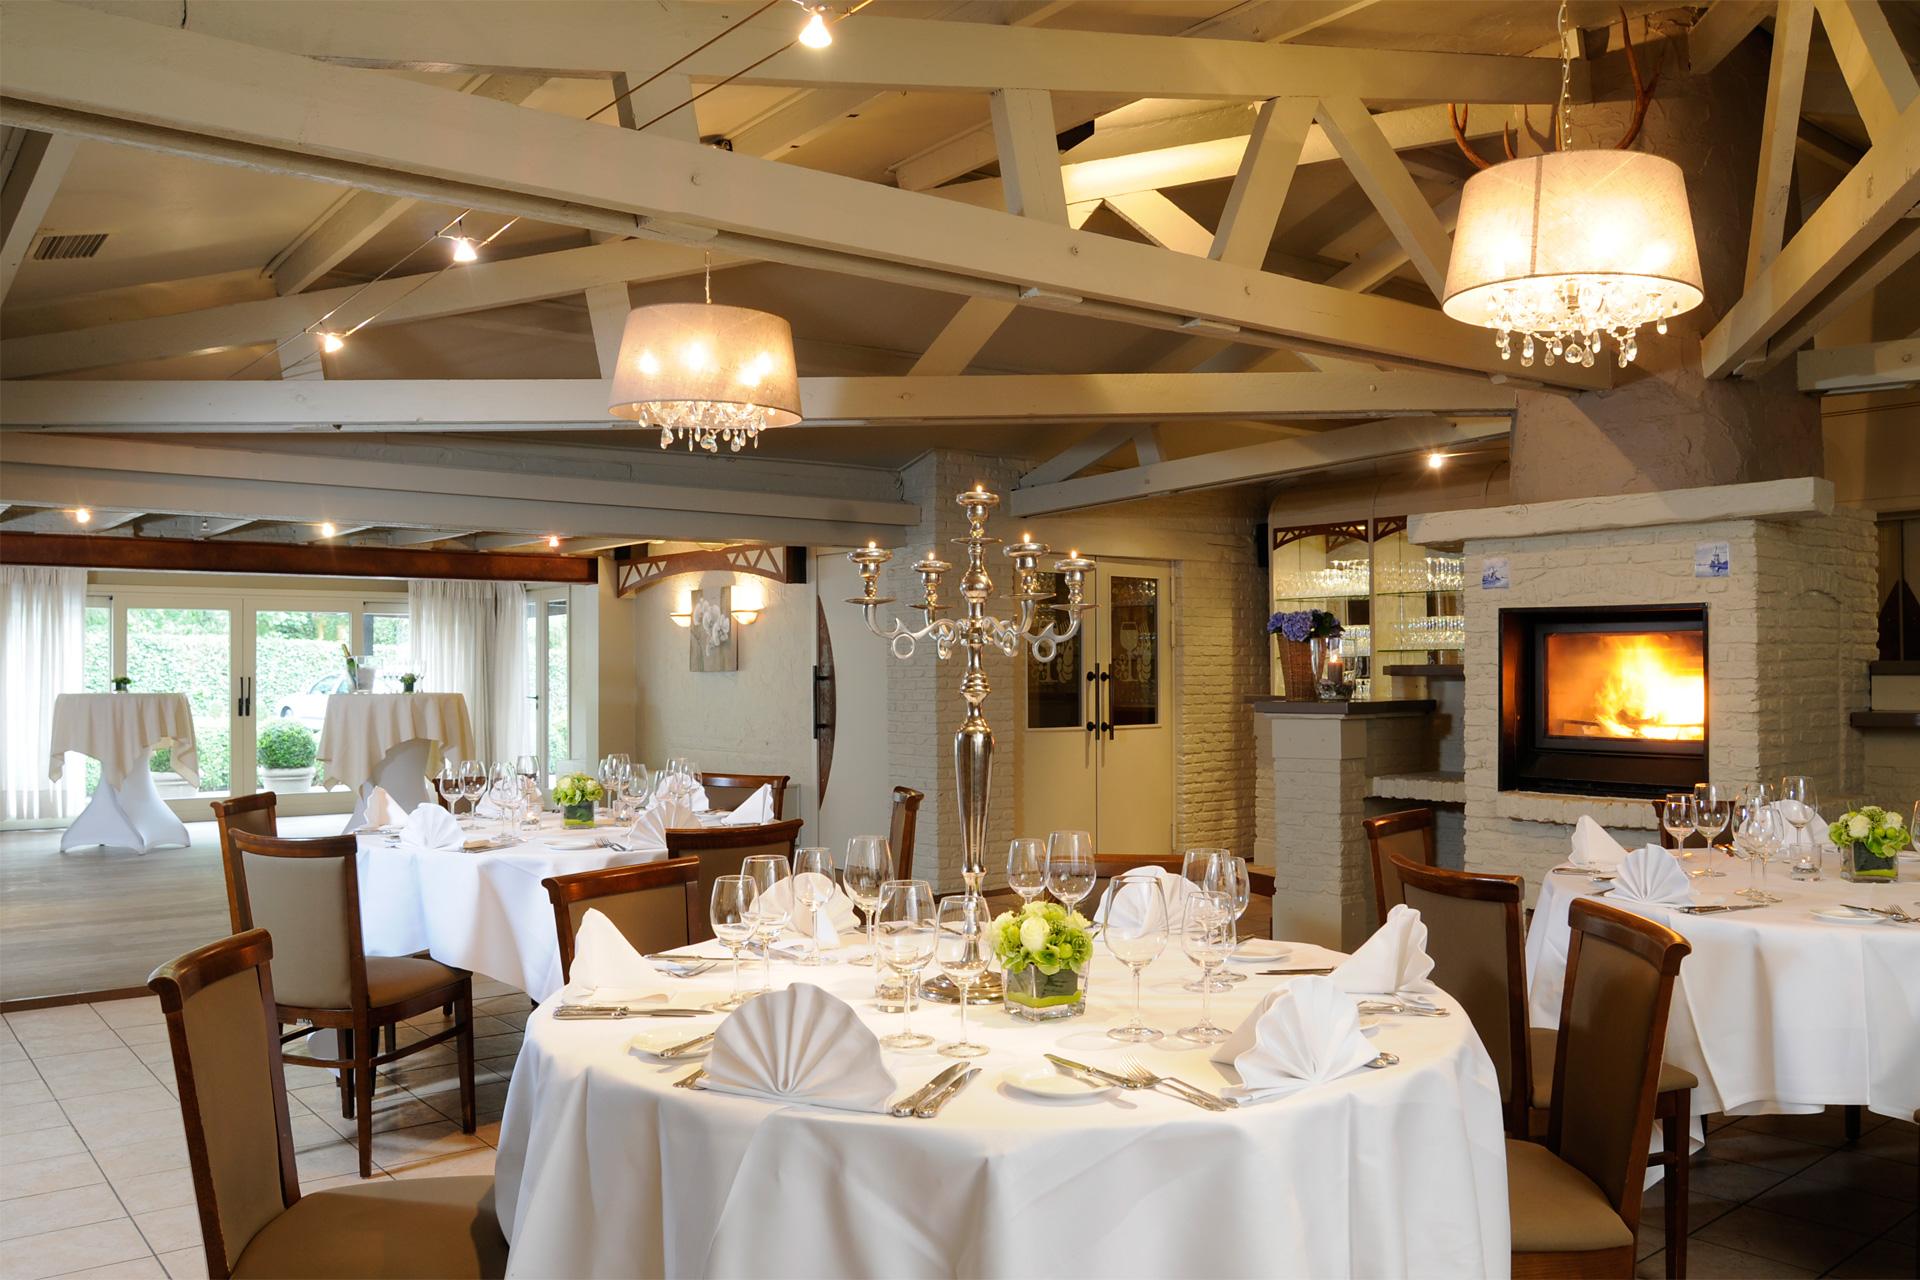 restaurant-malpertus-in-st-niklaas_DSC4257